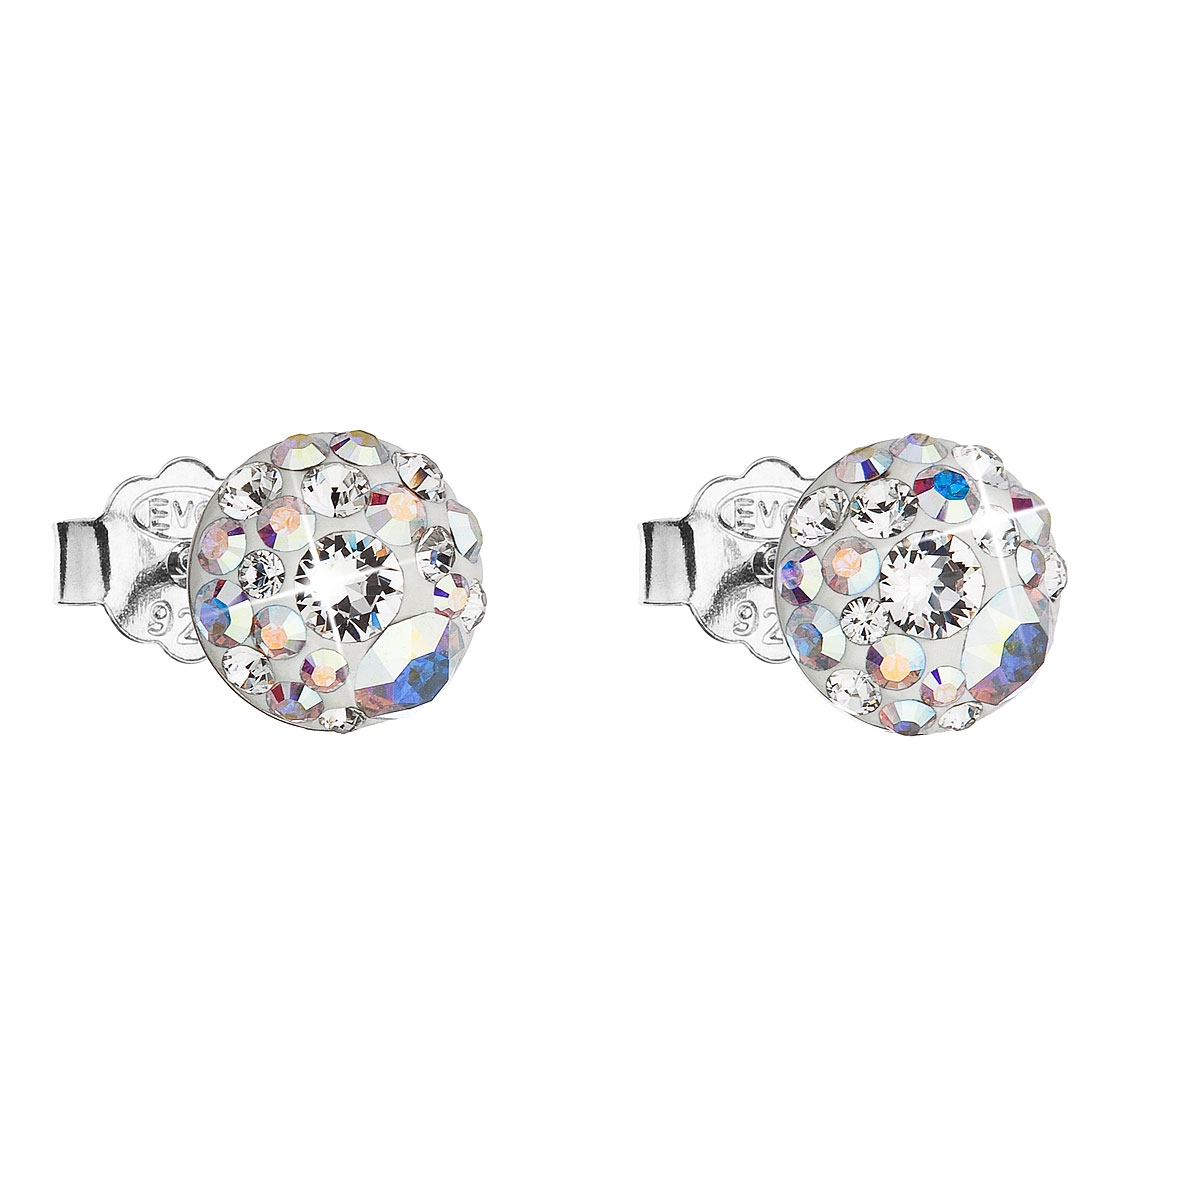 Stříbrné náušnice s krystaly Crystals from Swarovski® AB EG2008-ABX